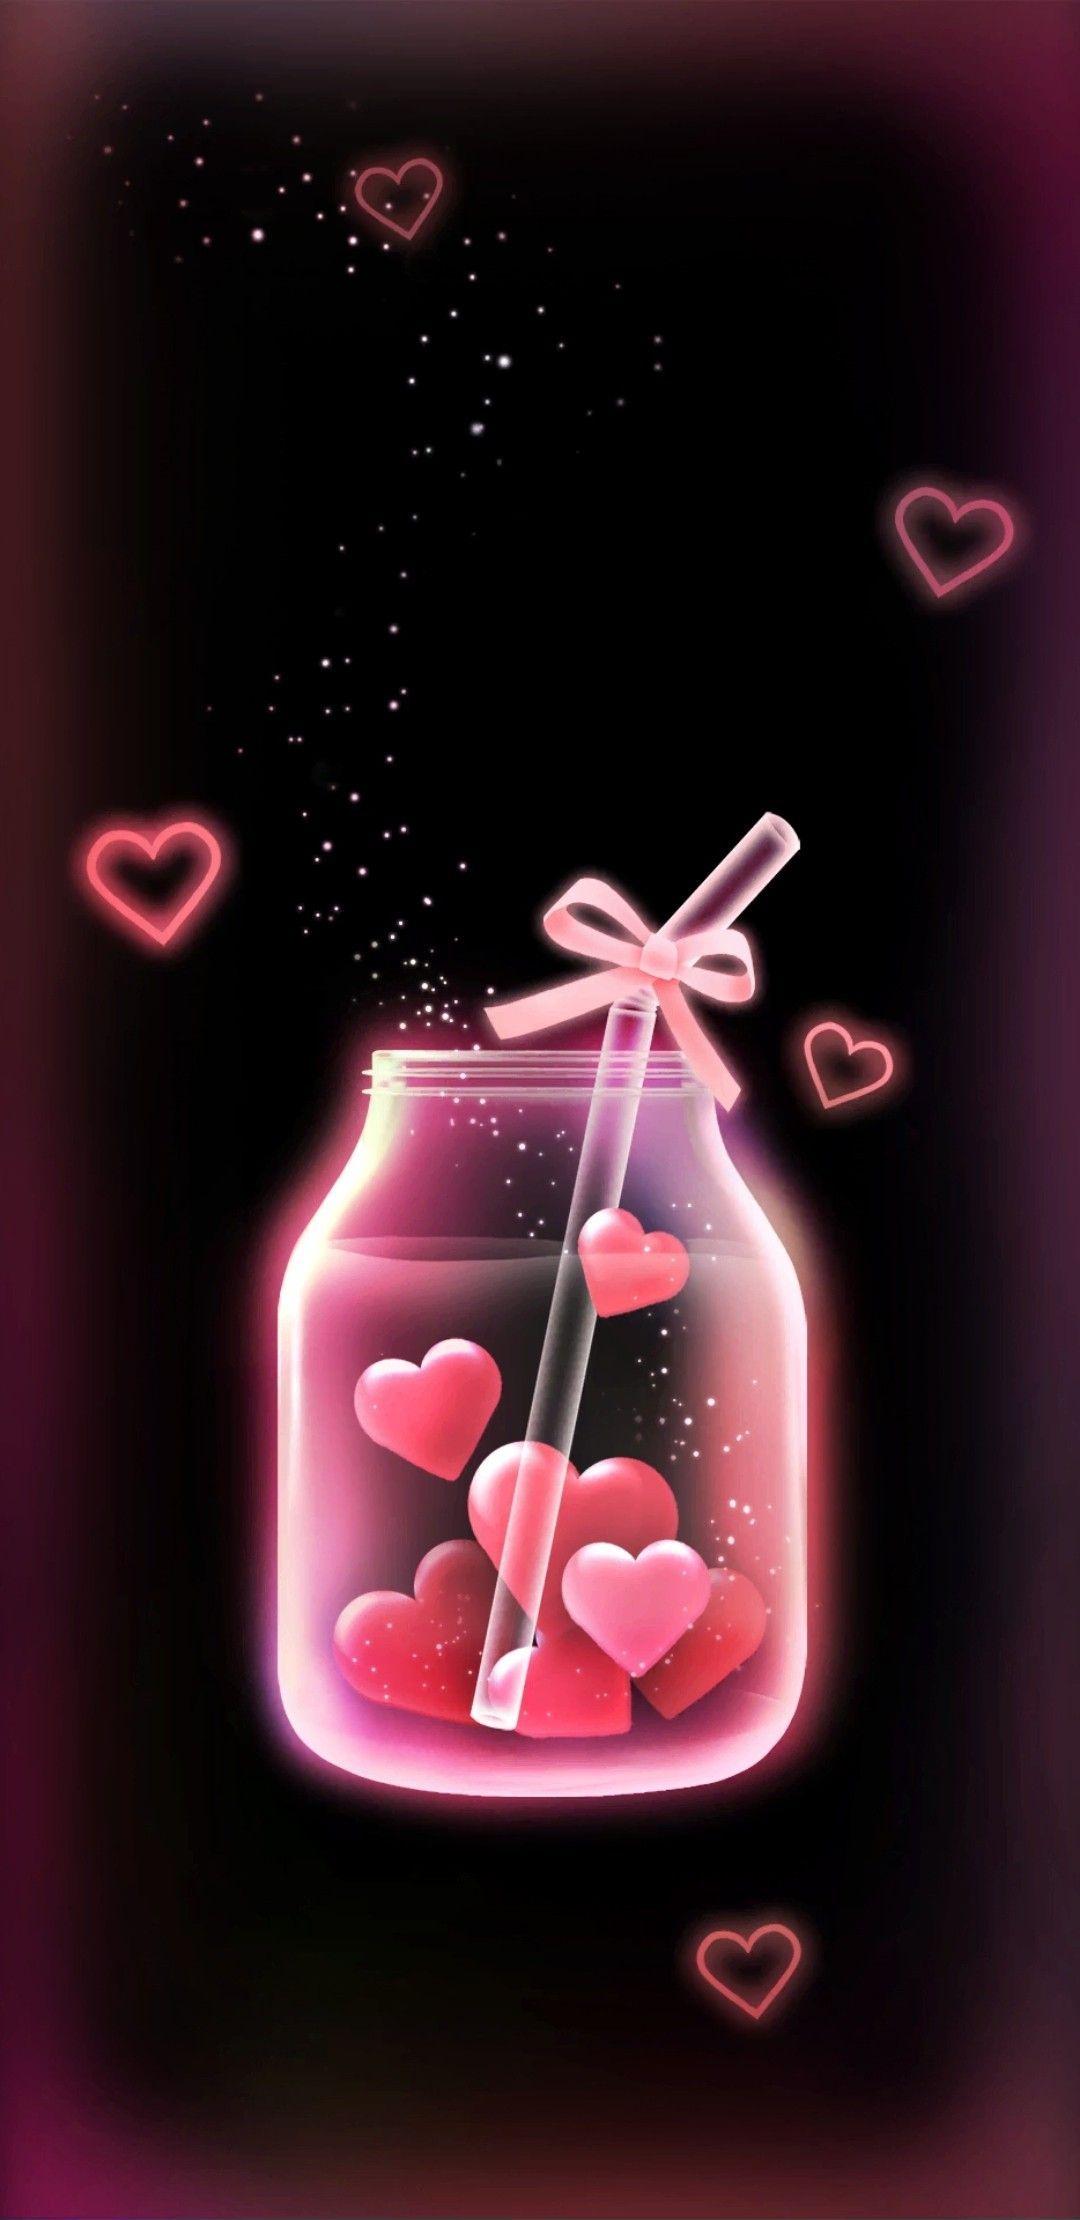 Wallpaper Valentines Day